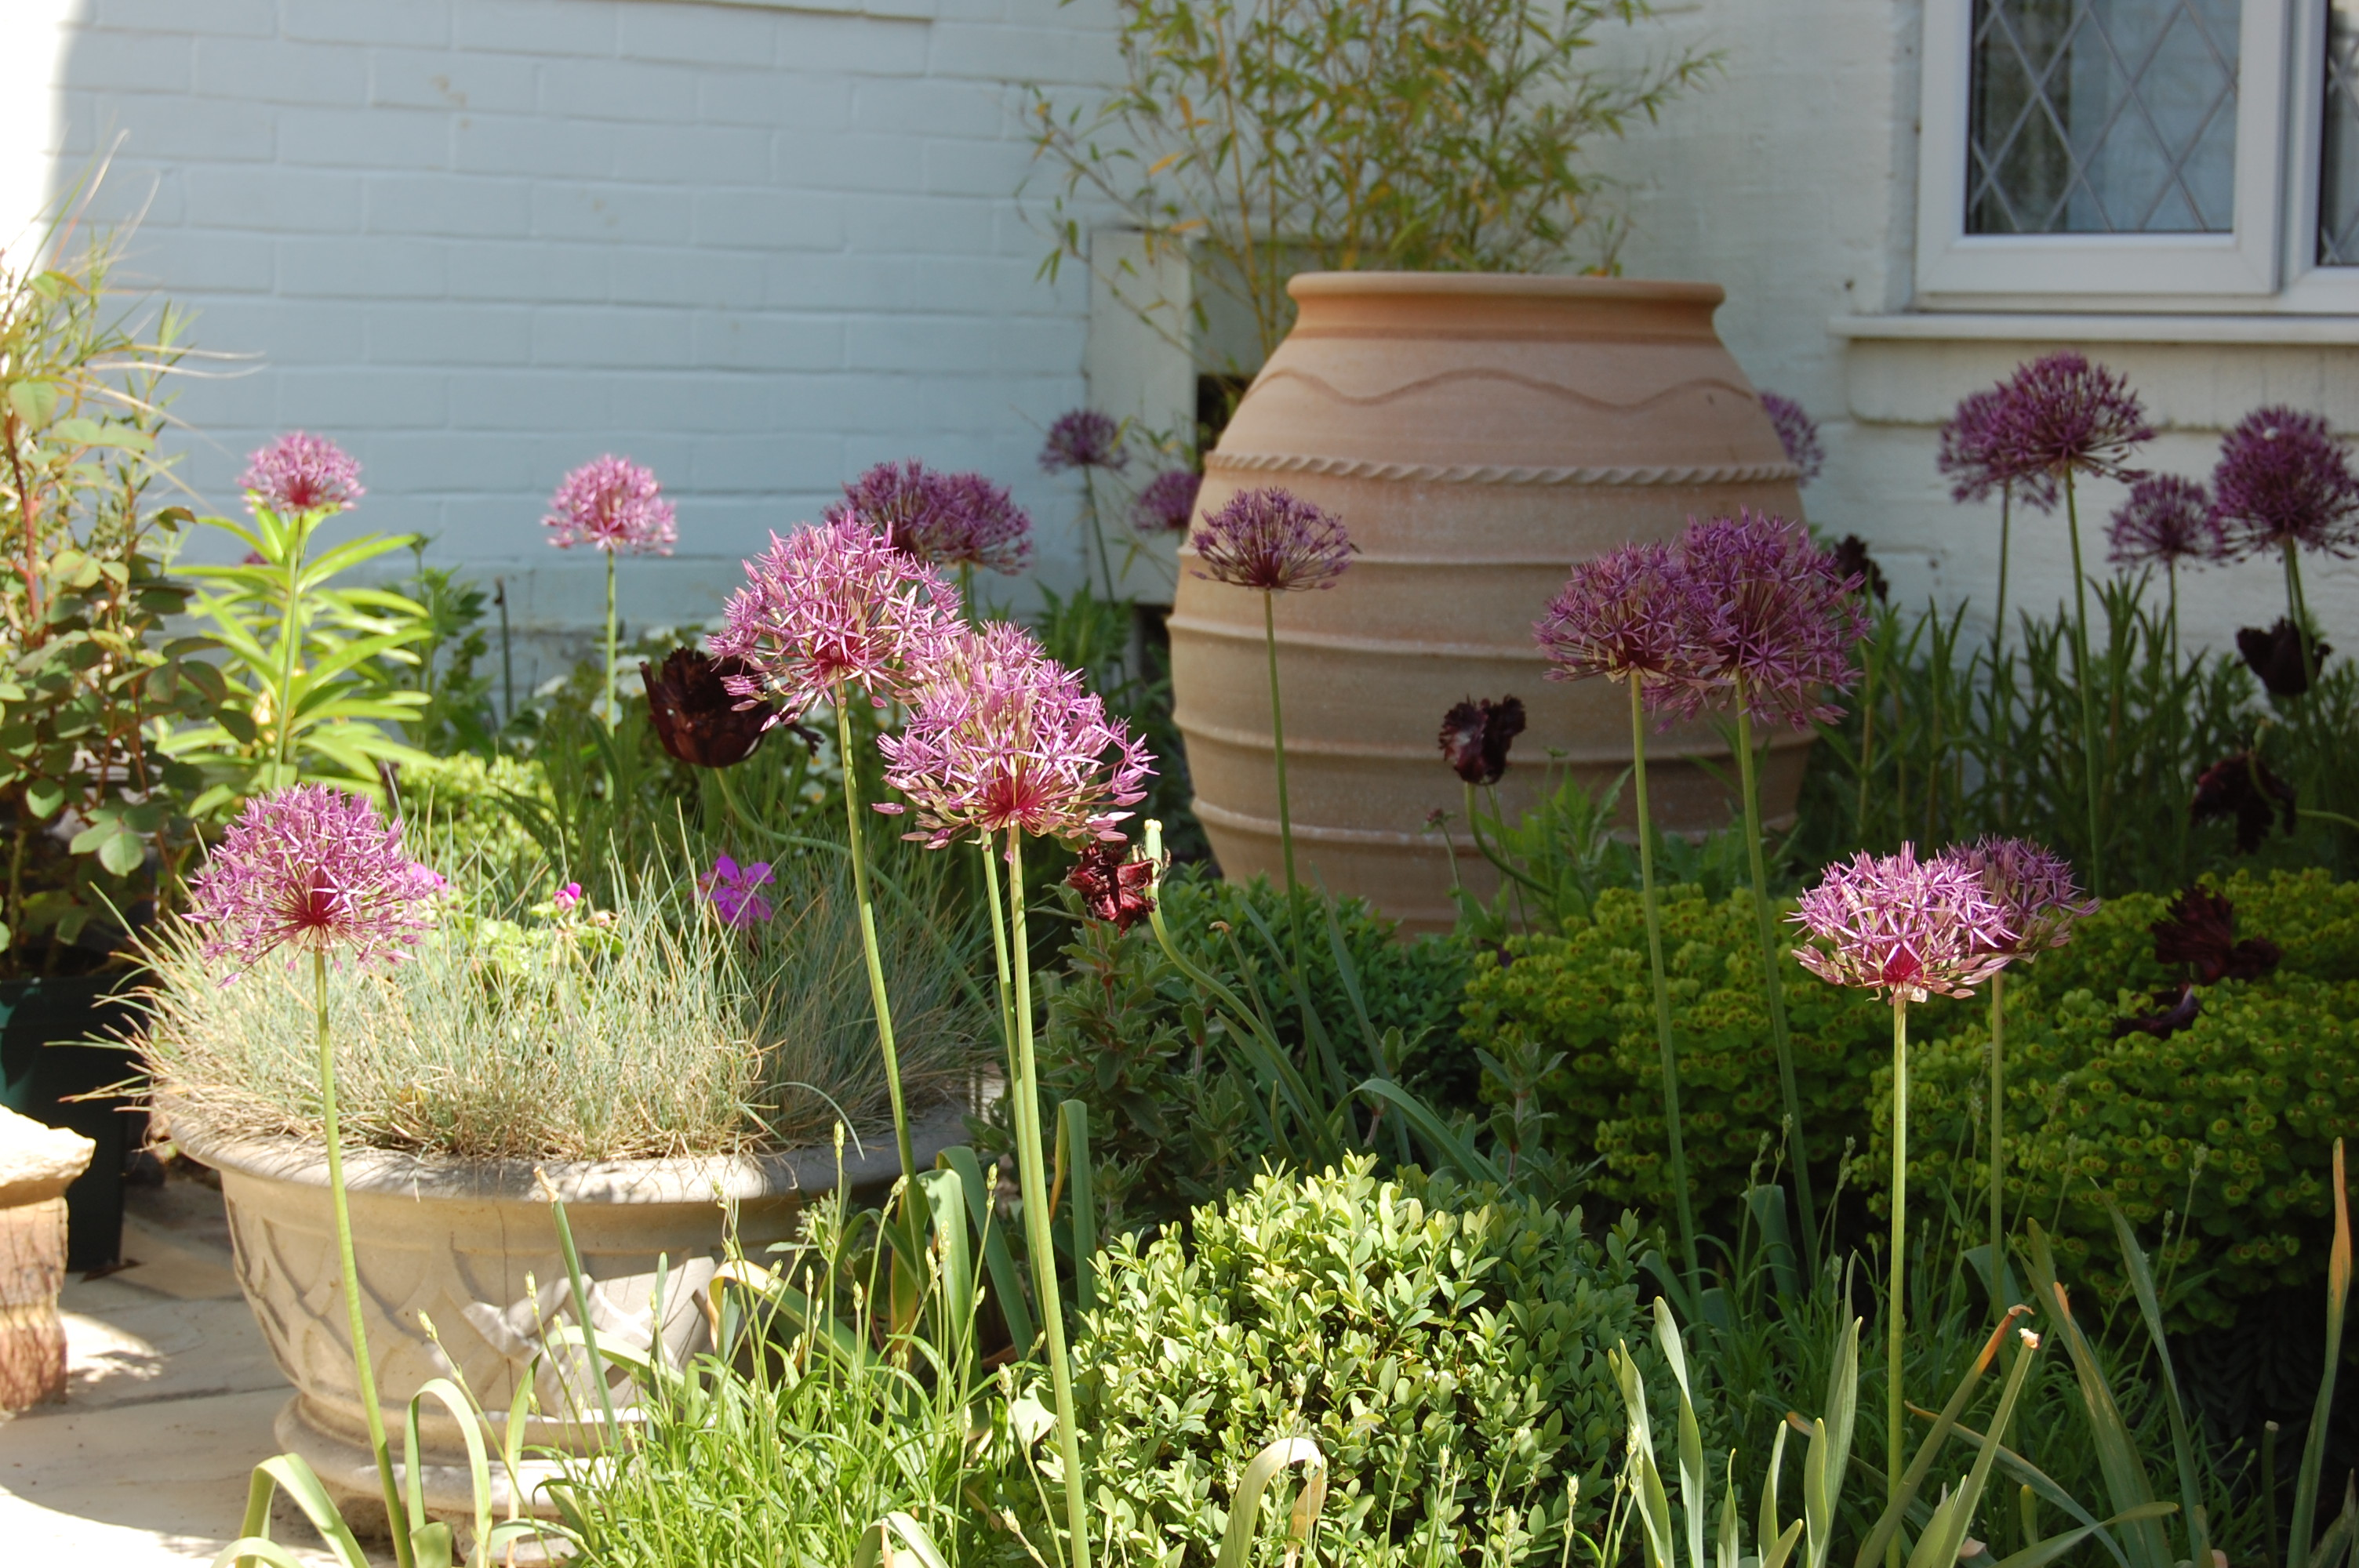 Picture showing a garden design by Ben MacDonald